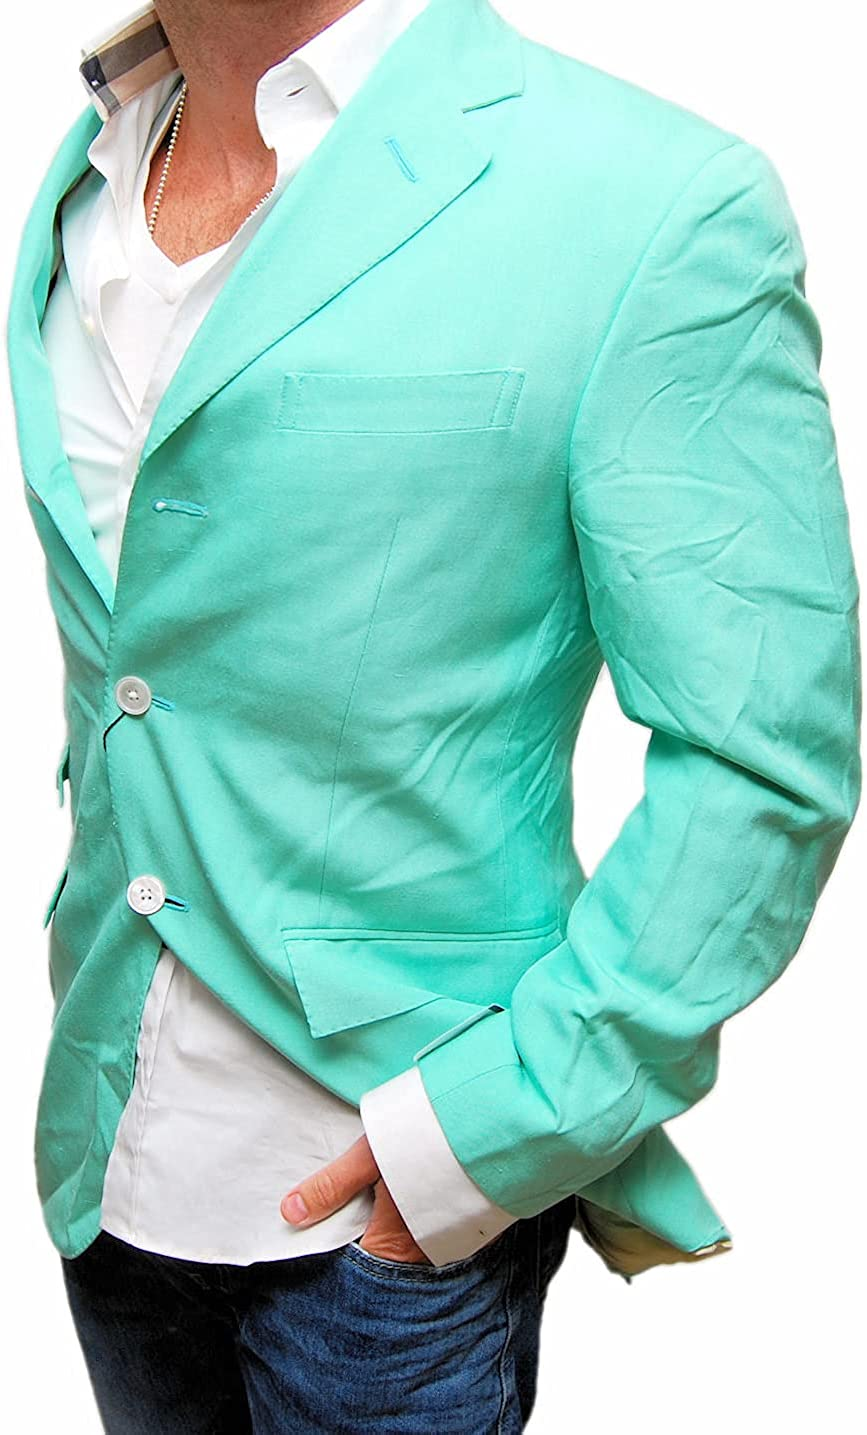 Ralph Lauren Polo Mens Blazer Sport Coat Jacket Silk Light Pastel Light Green Italy